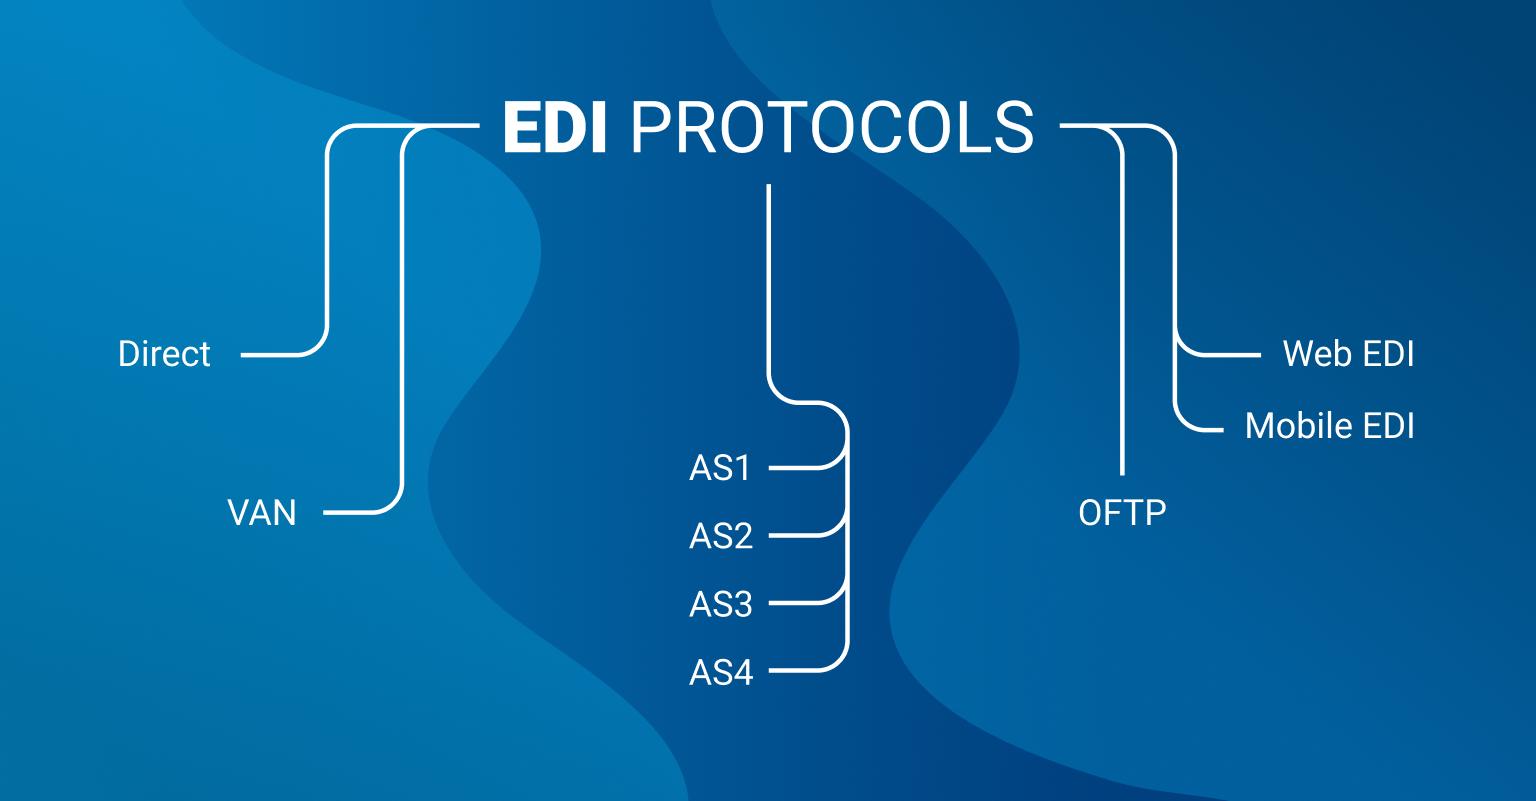 types of EDI protocols